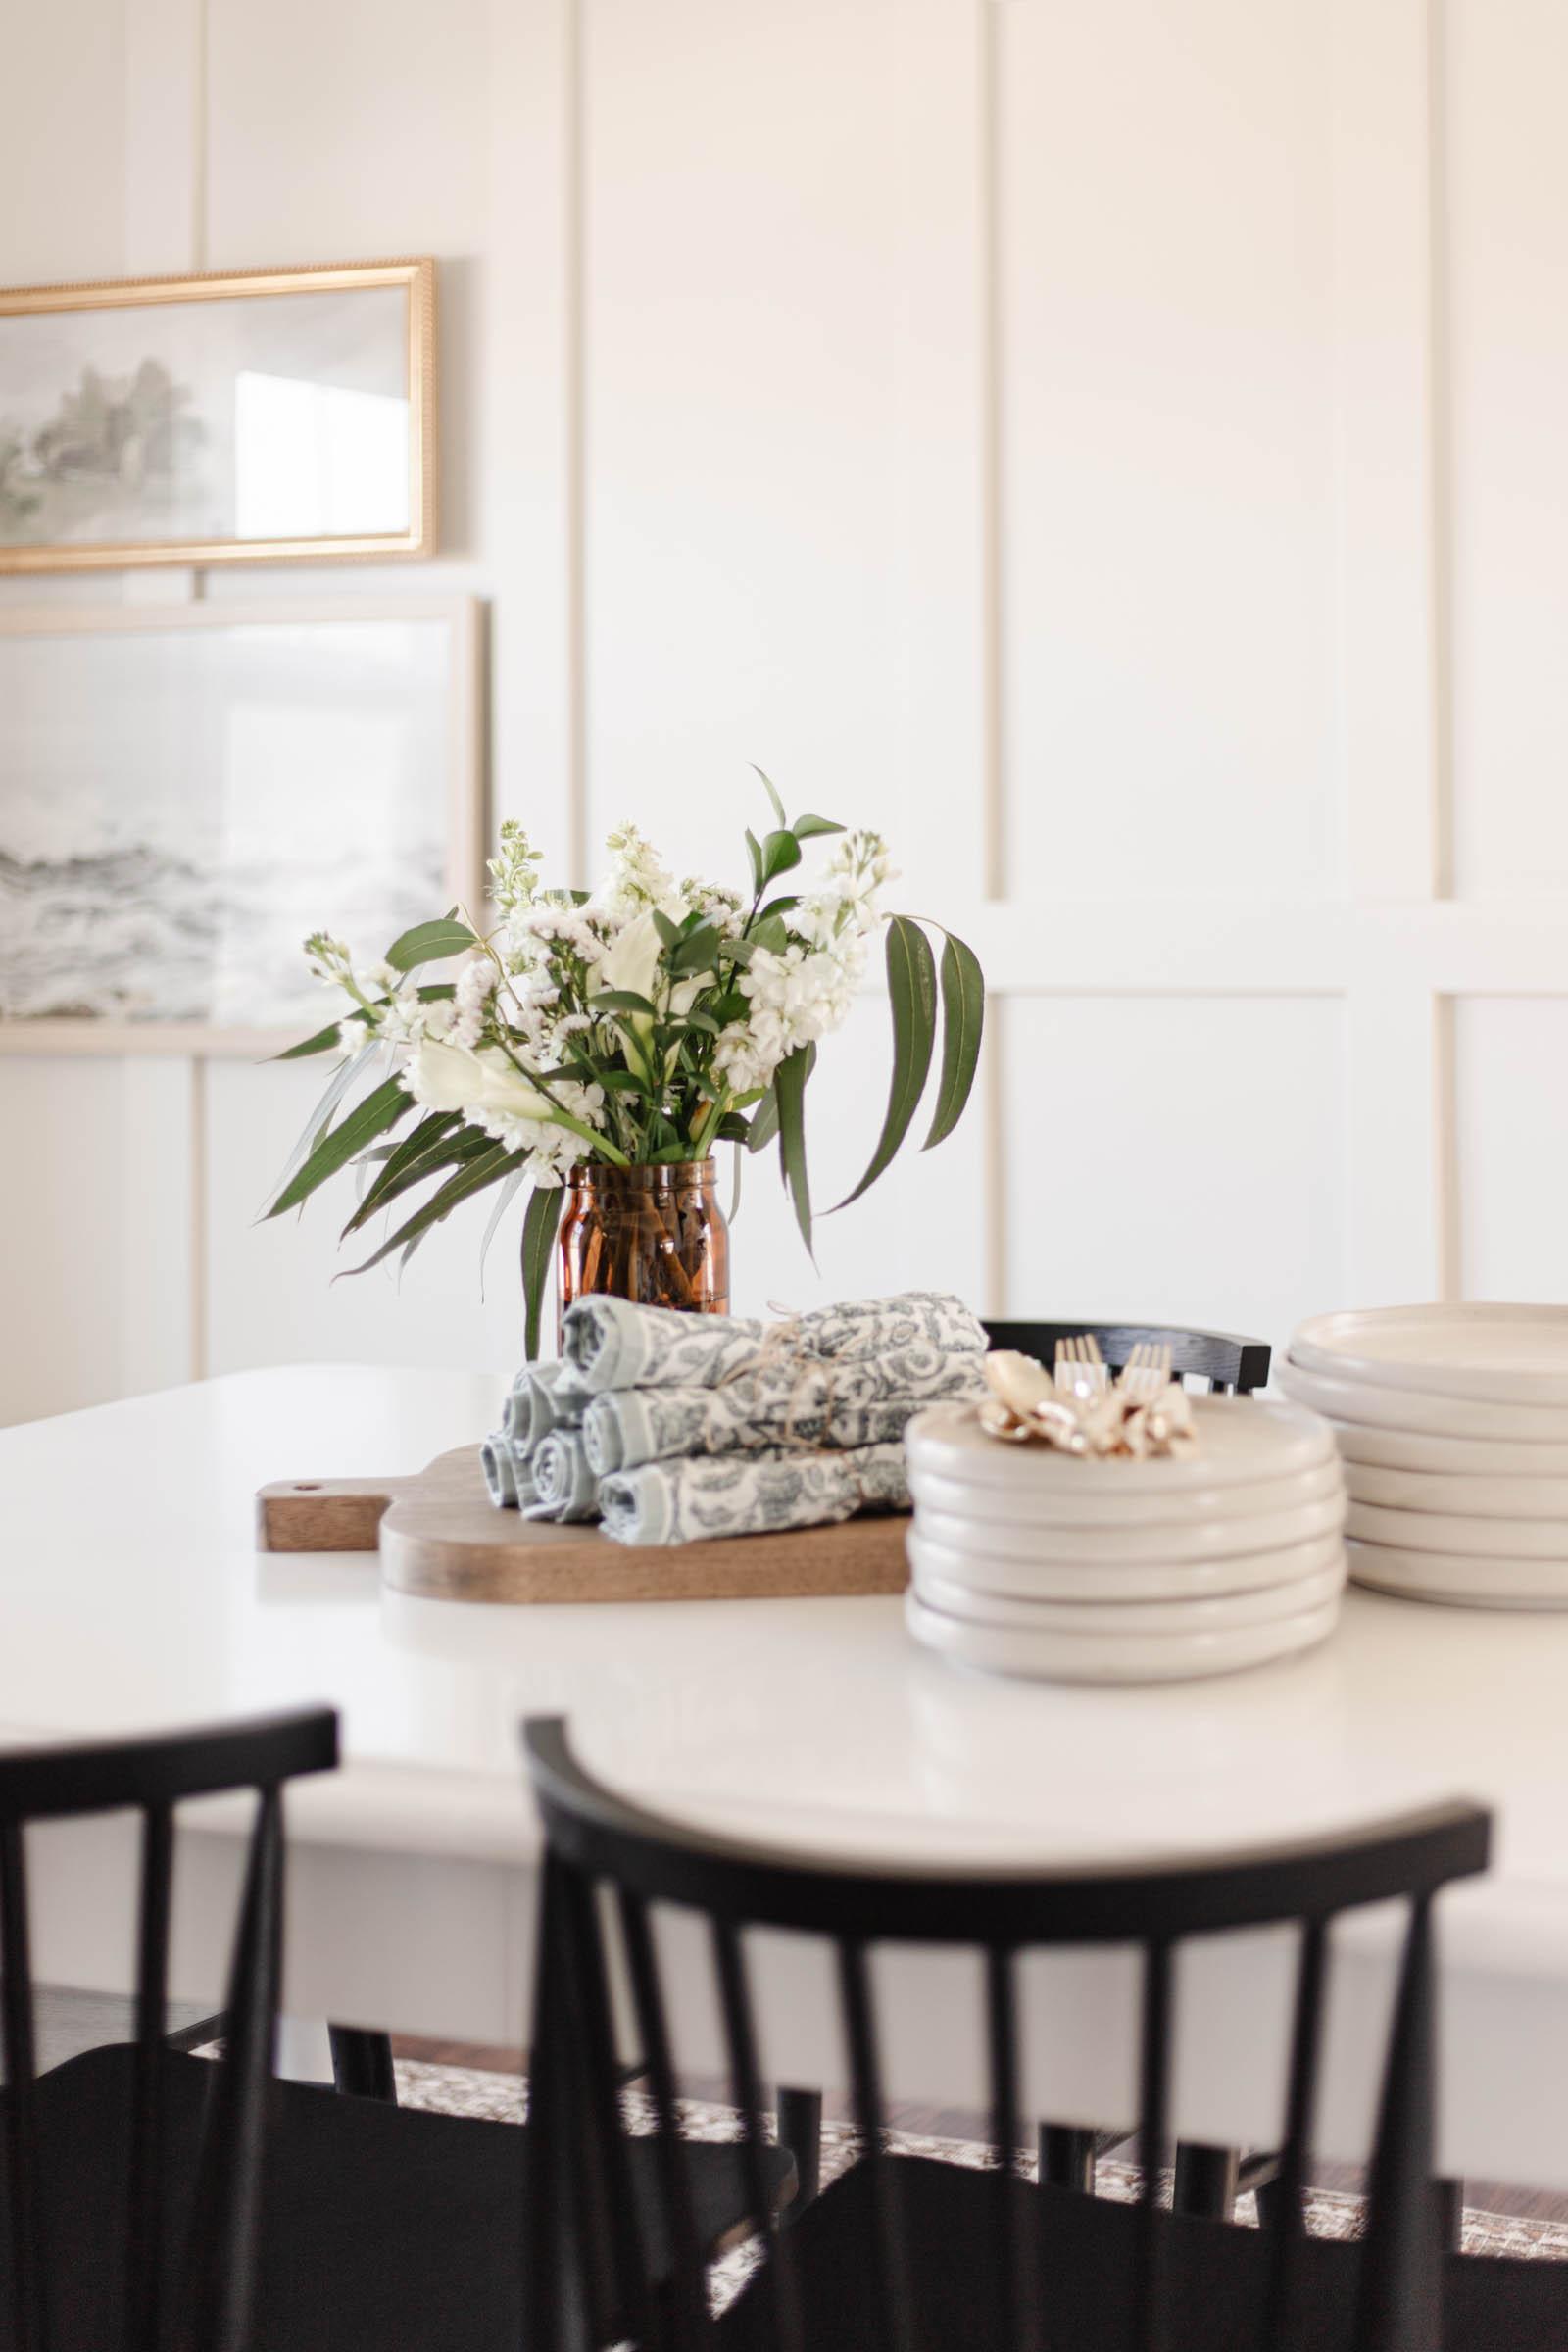 tables cape staples: dinner and salad plates, cloth napkins, flatware, centerpiece